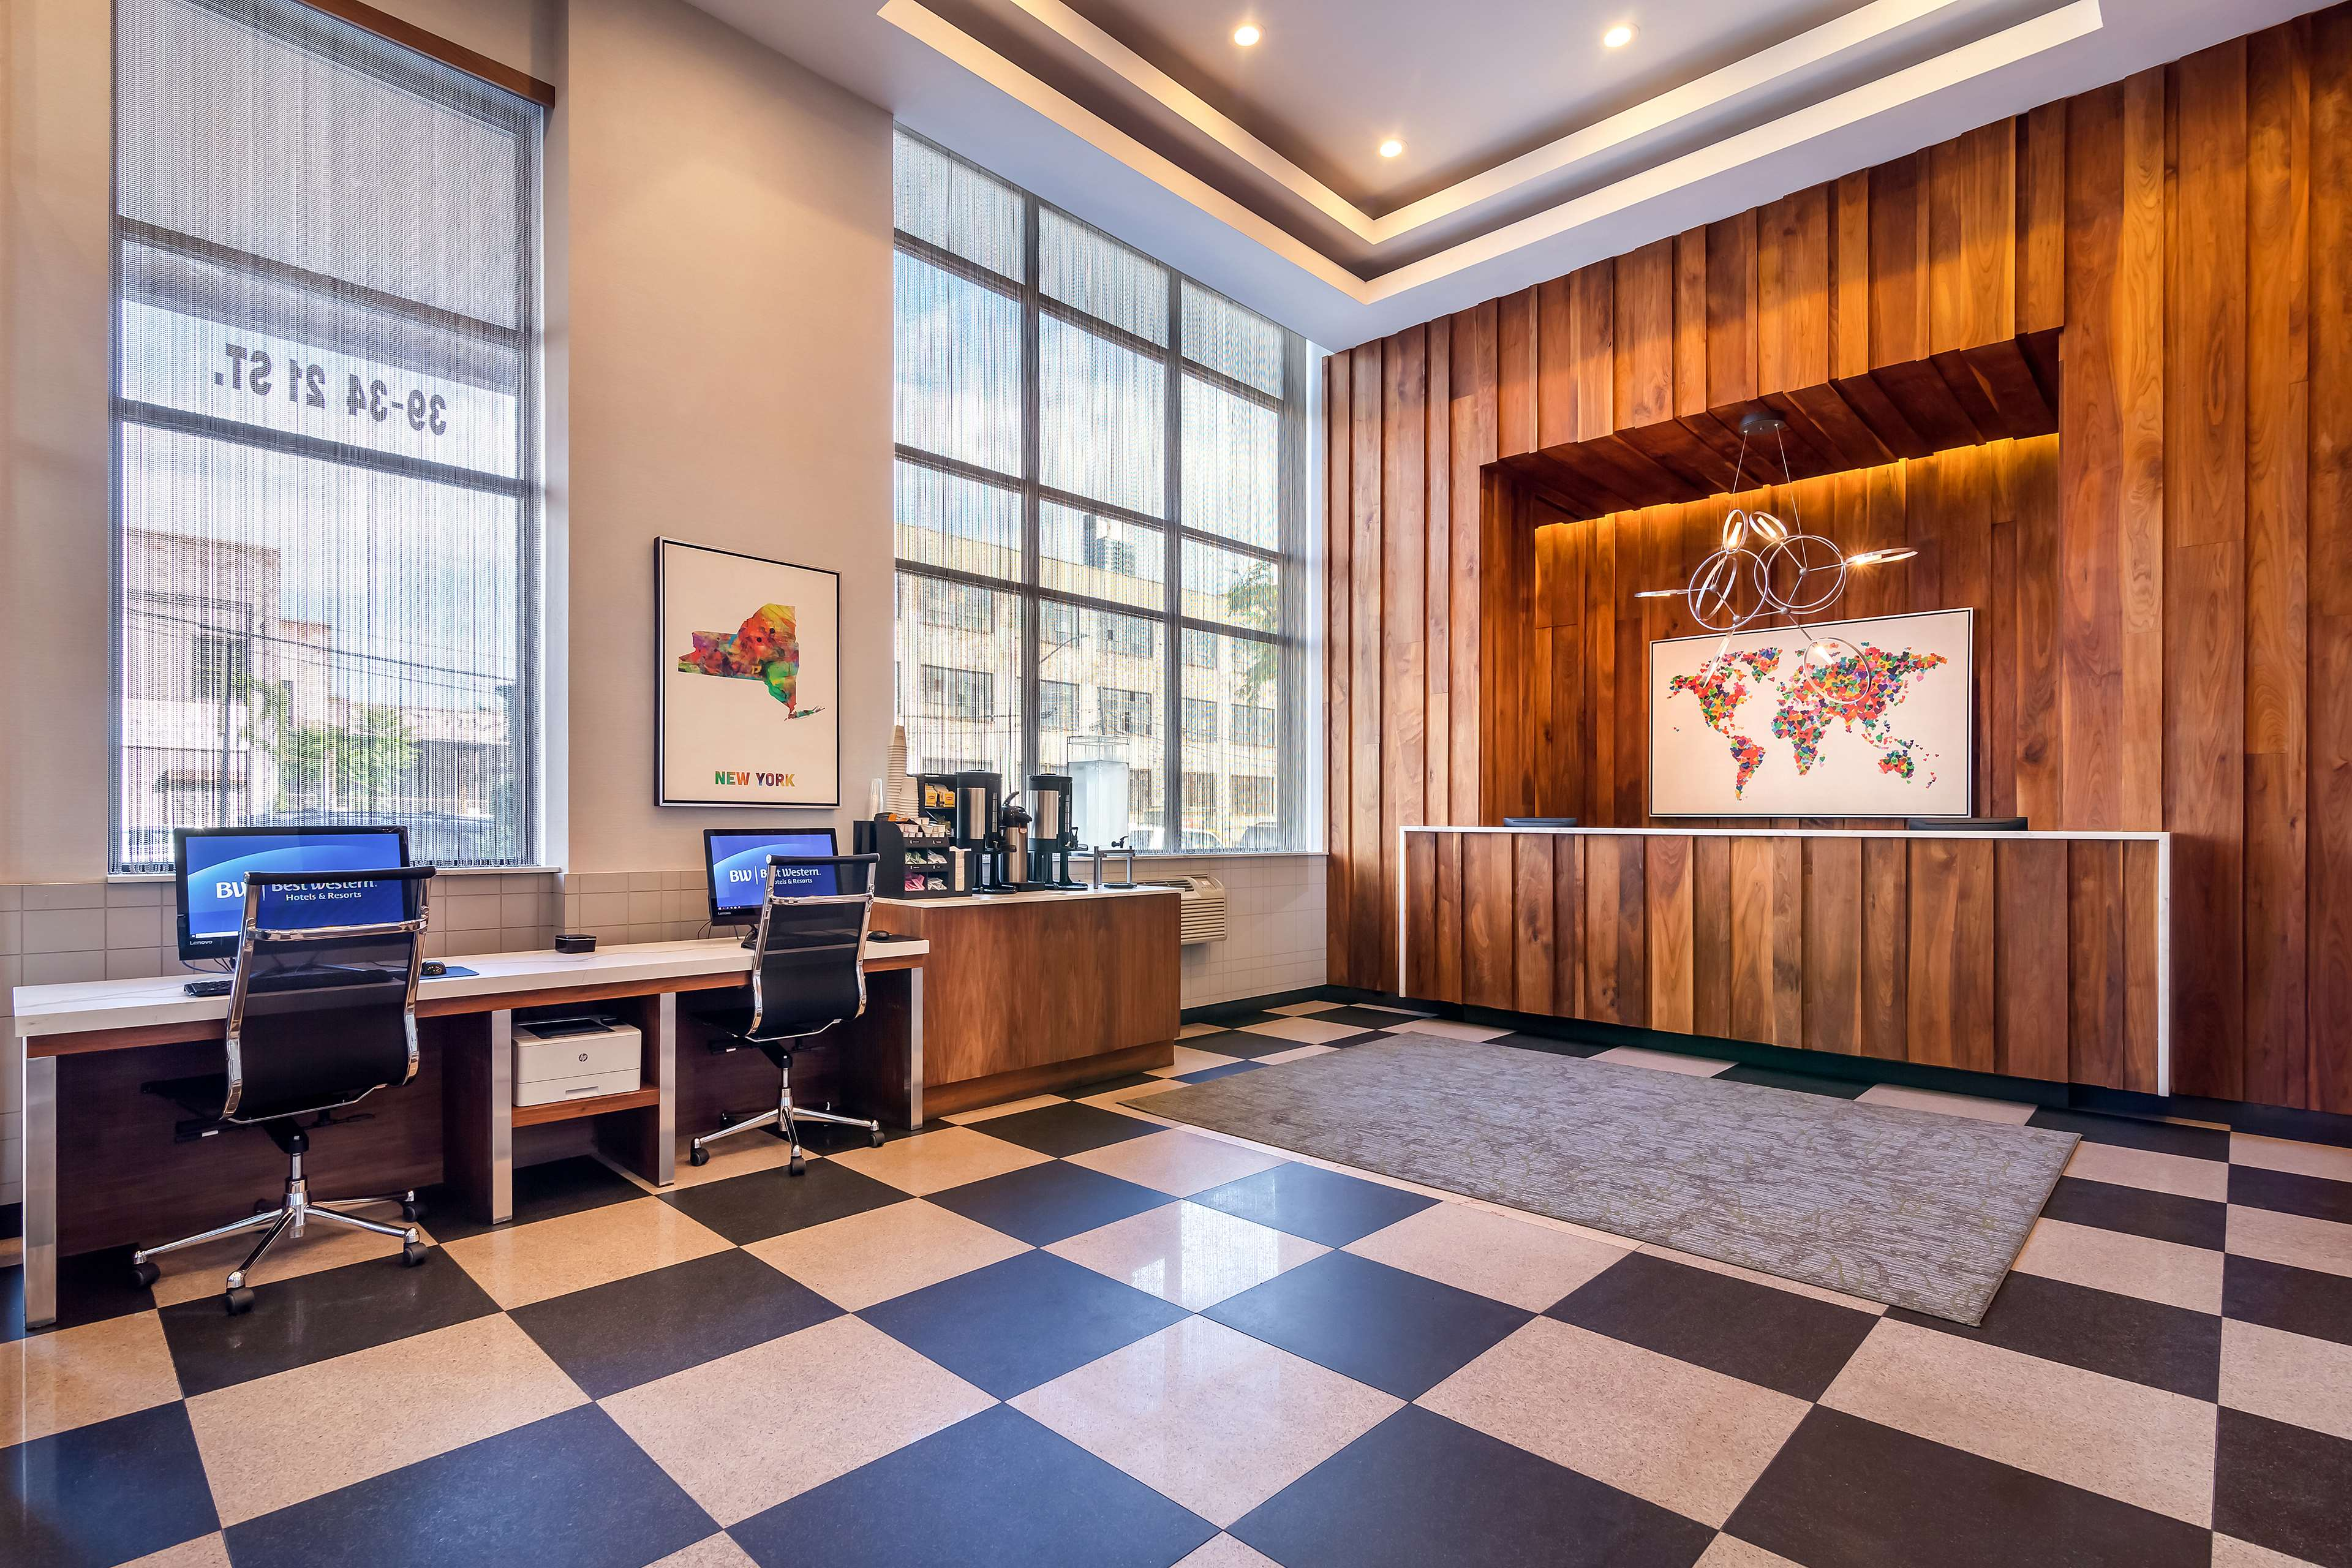 Best Western Plus Plaza Hotel image 7